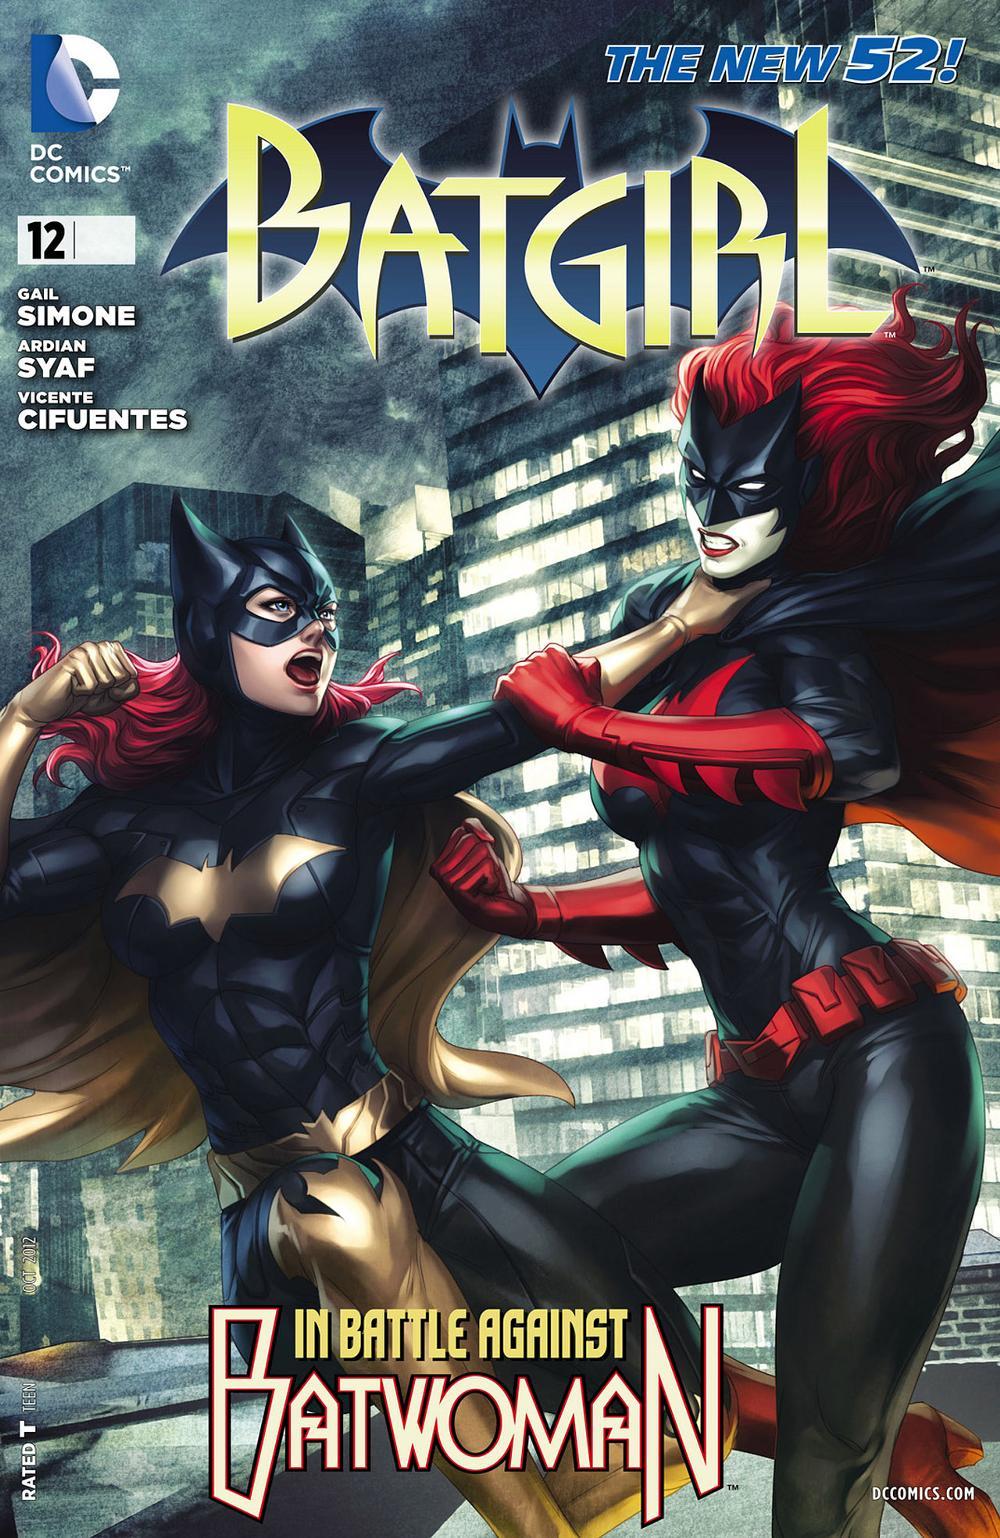 Batgirl 12 - Every Time I Fail